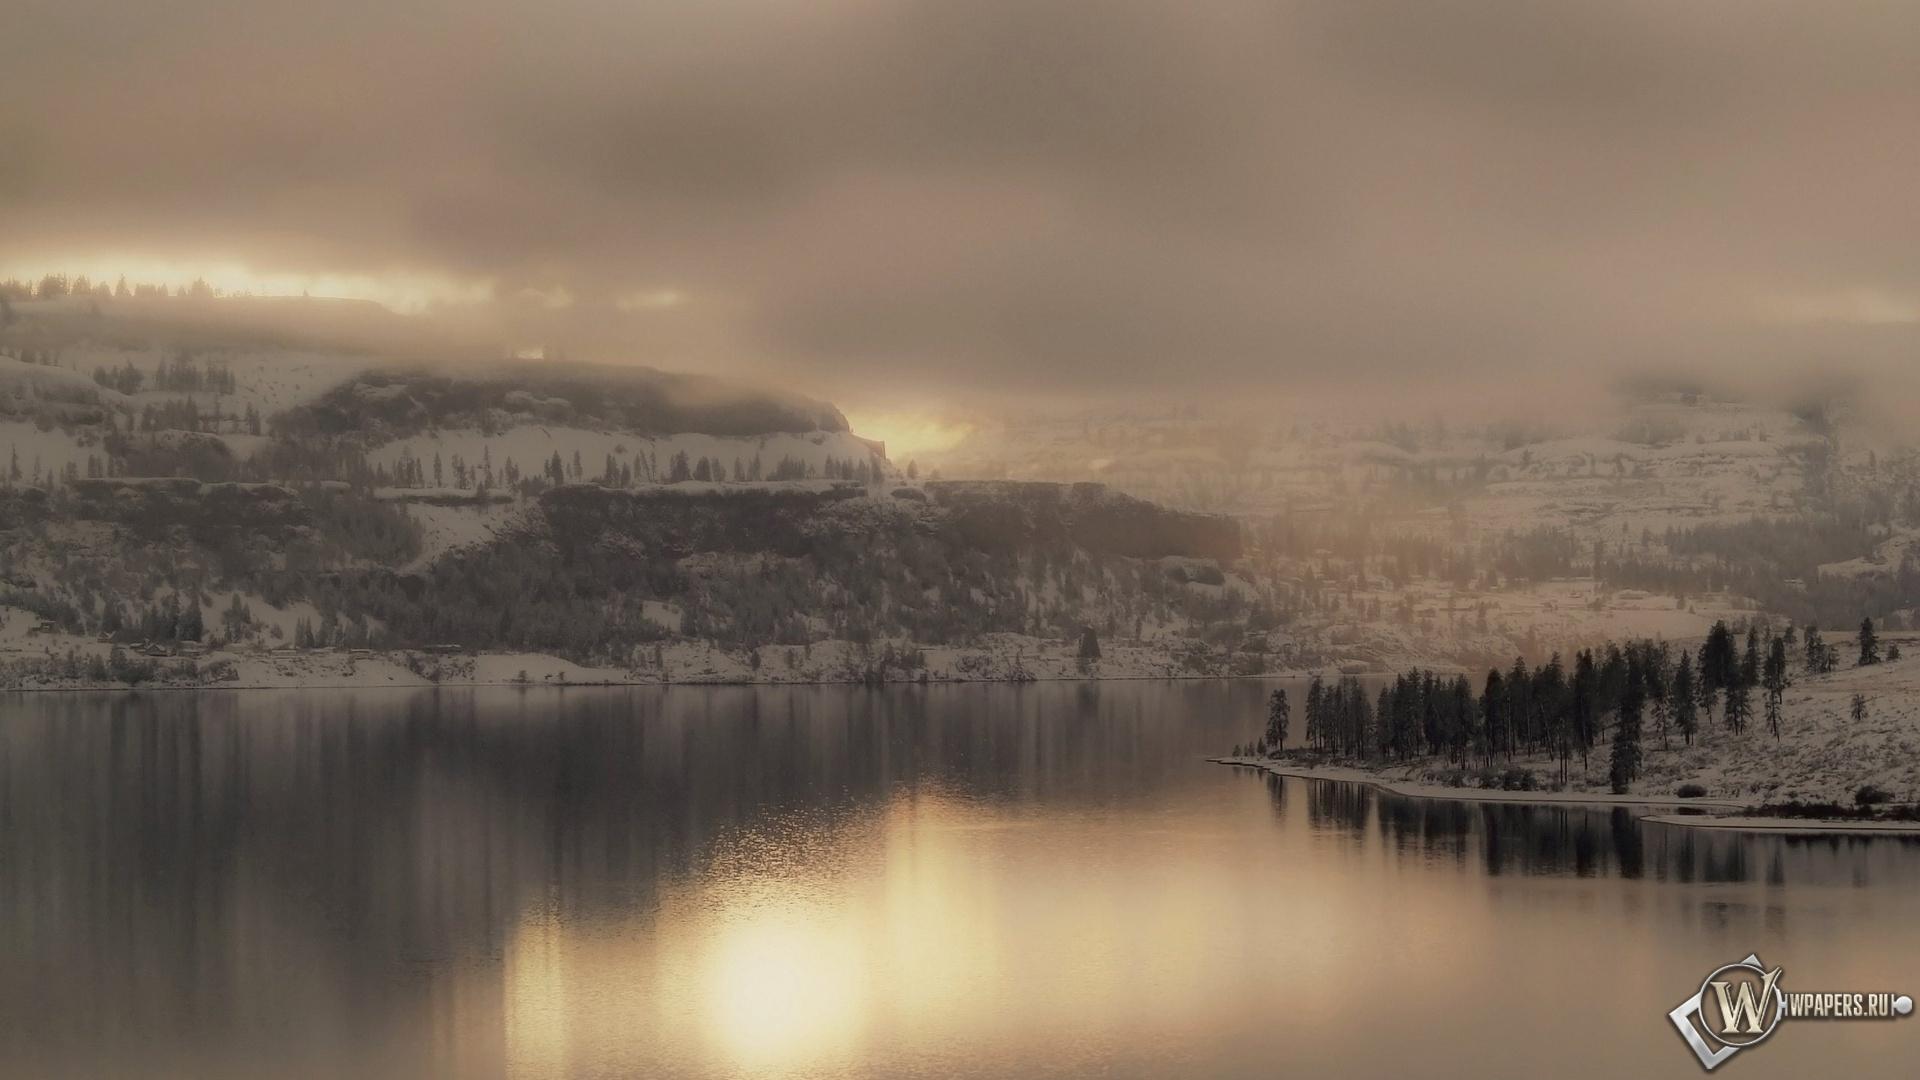 Картинки природа в тумане на рабочий стол